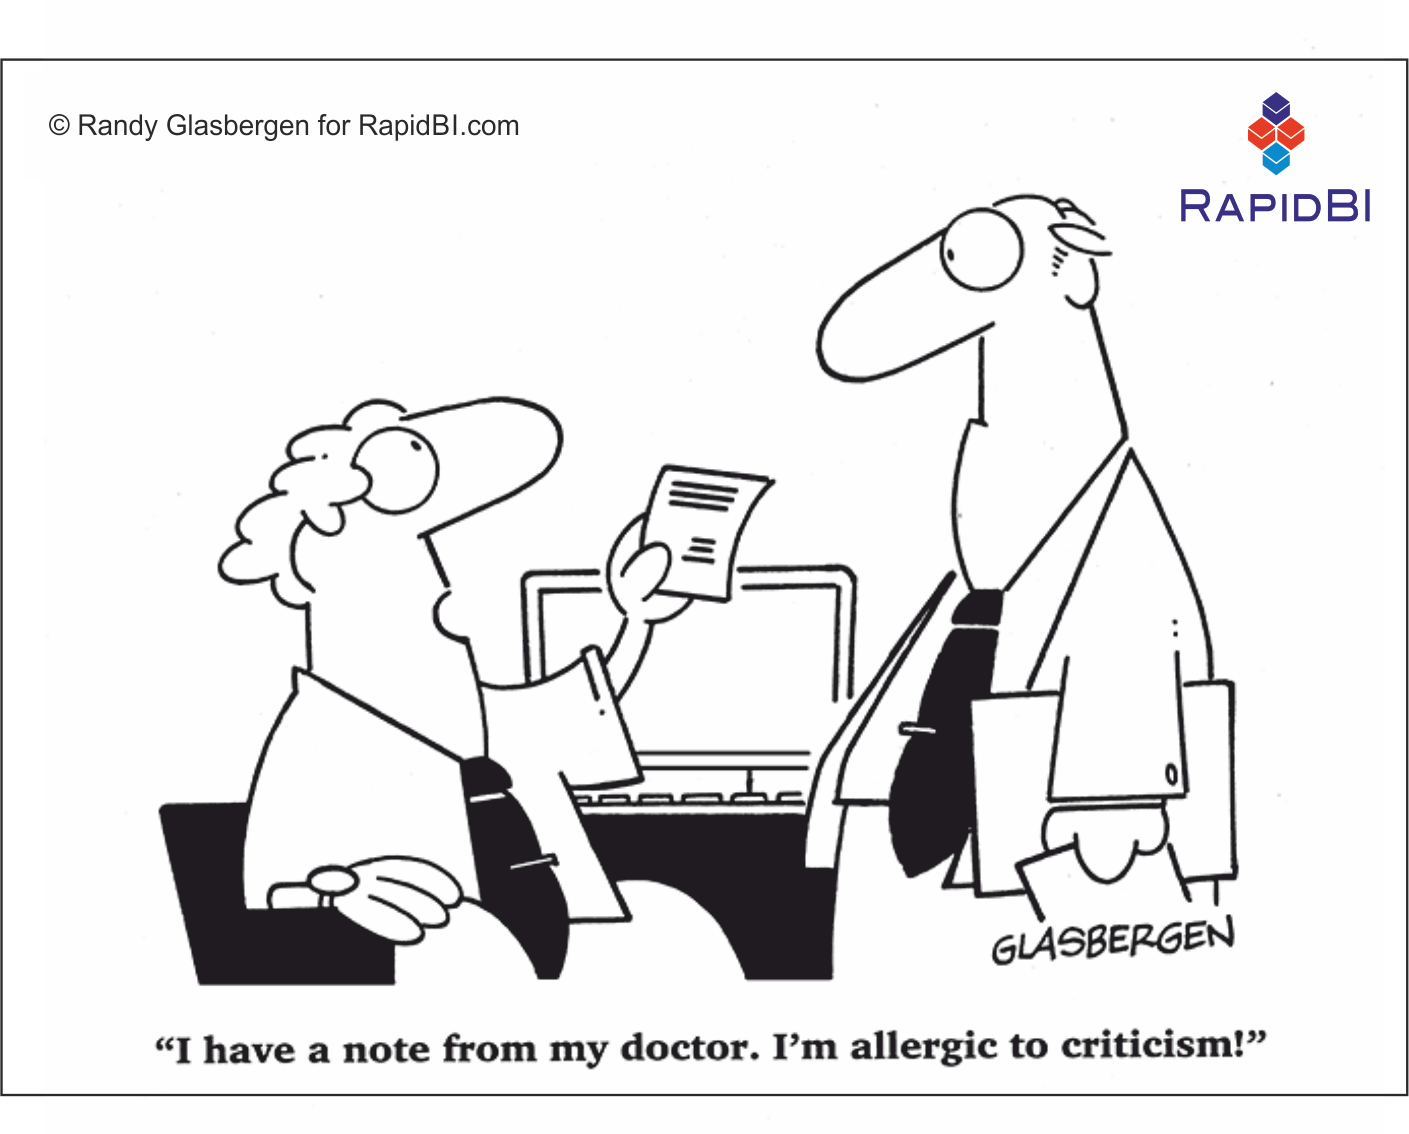 RapidBI Daily Cartoon #10